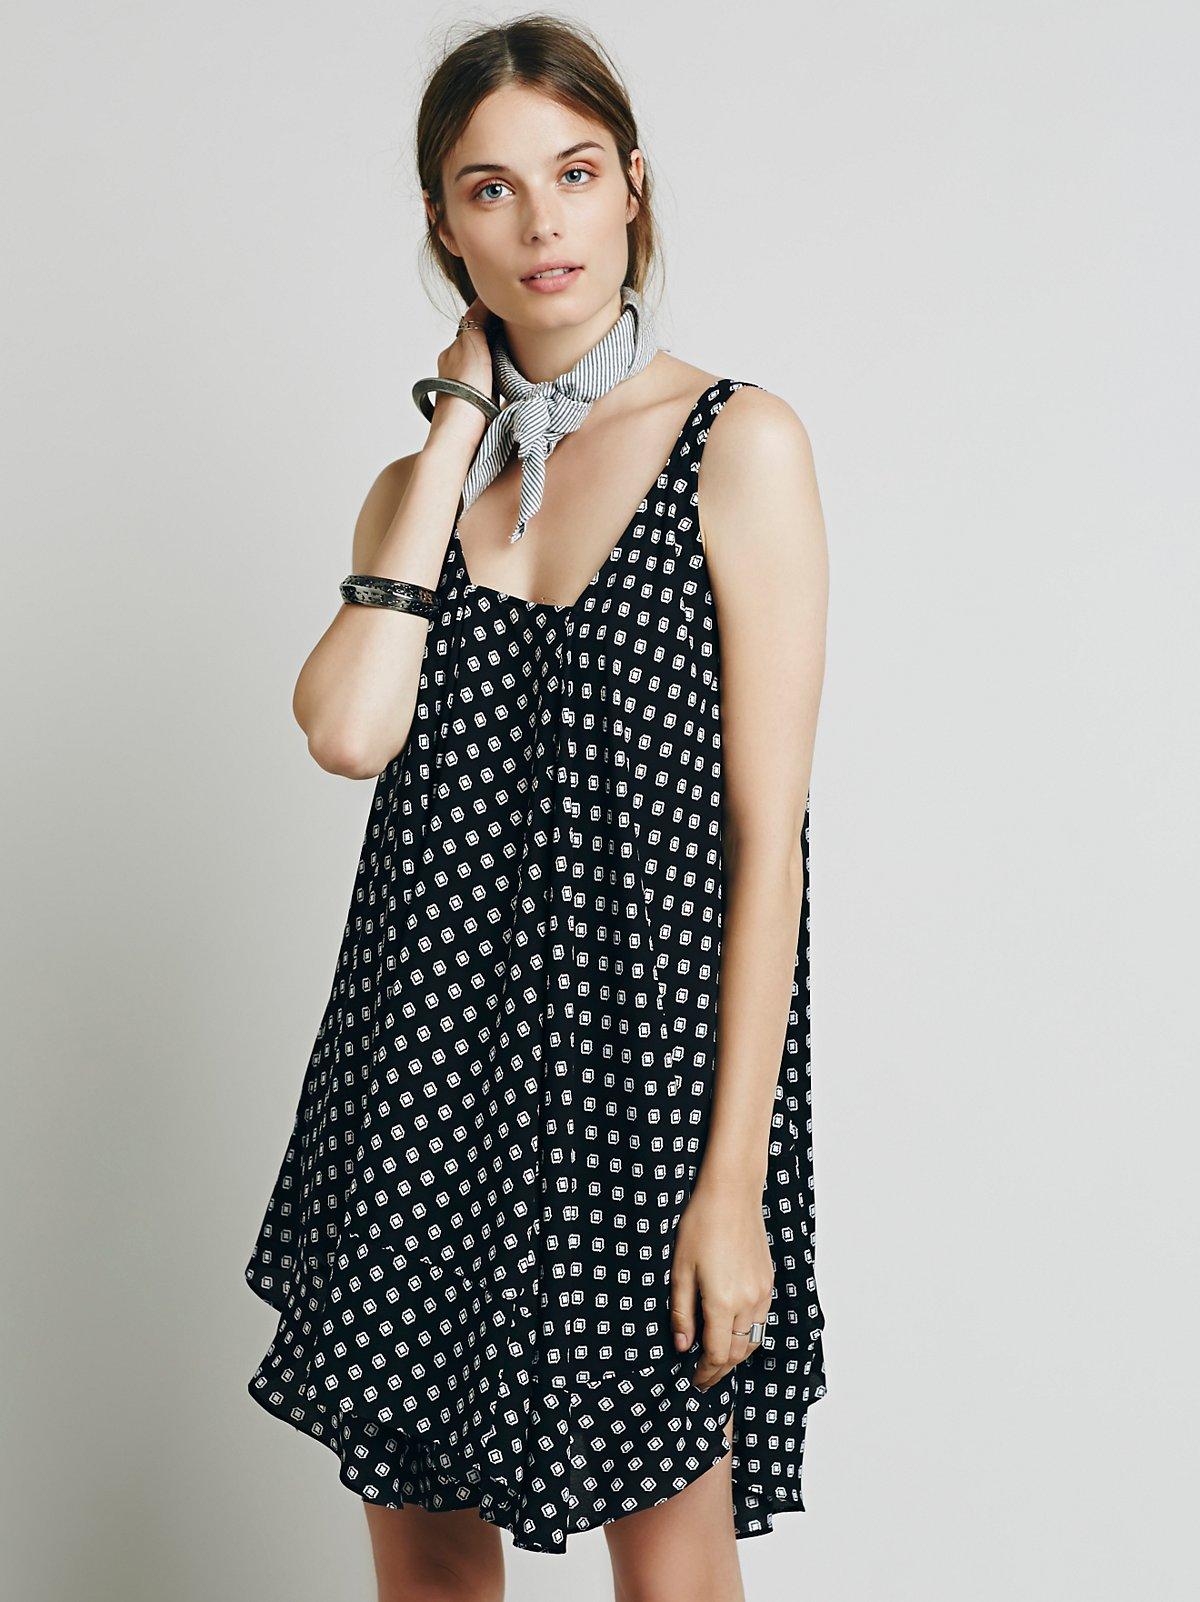 Simply Trapeze Dress